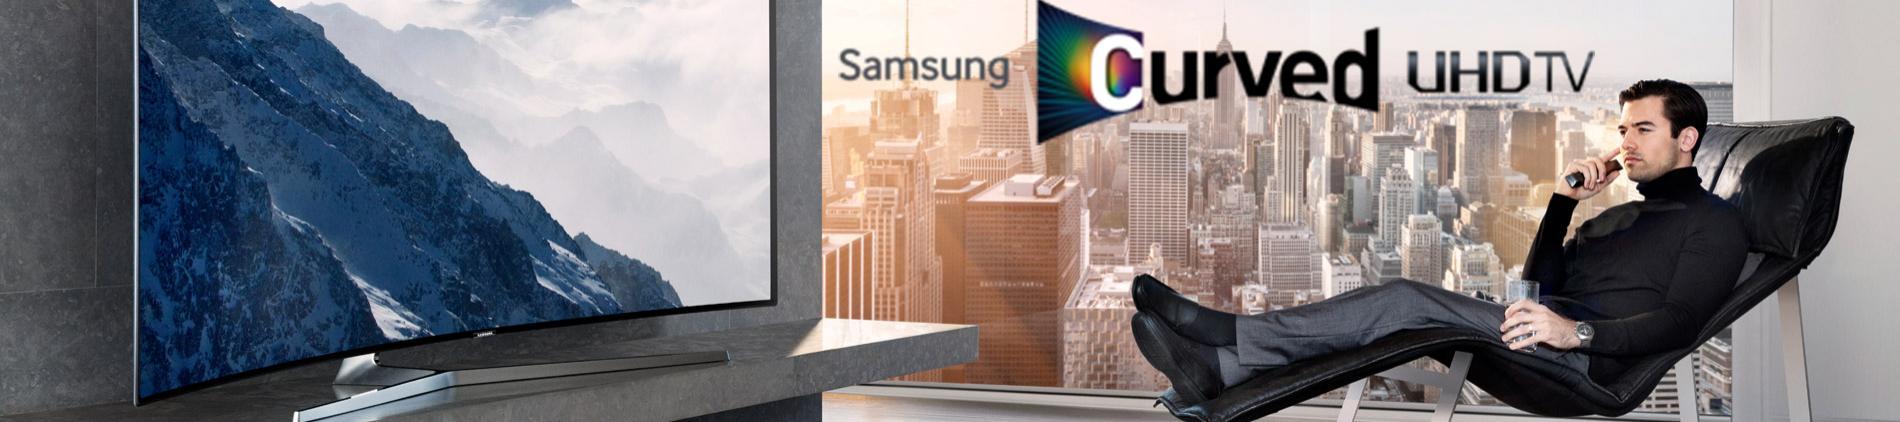 Samsung Curved 4K UHD TV